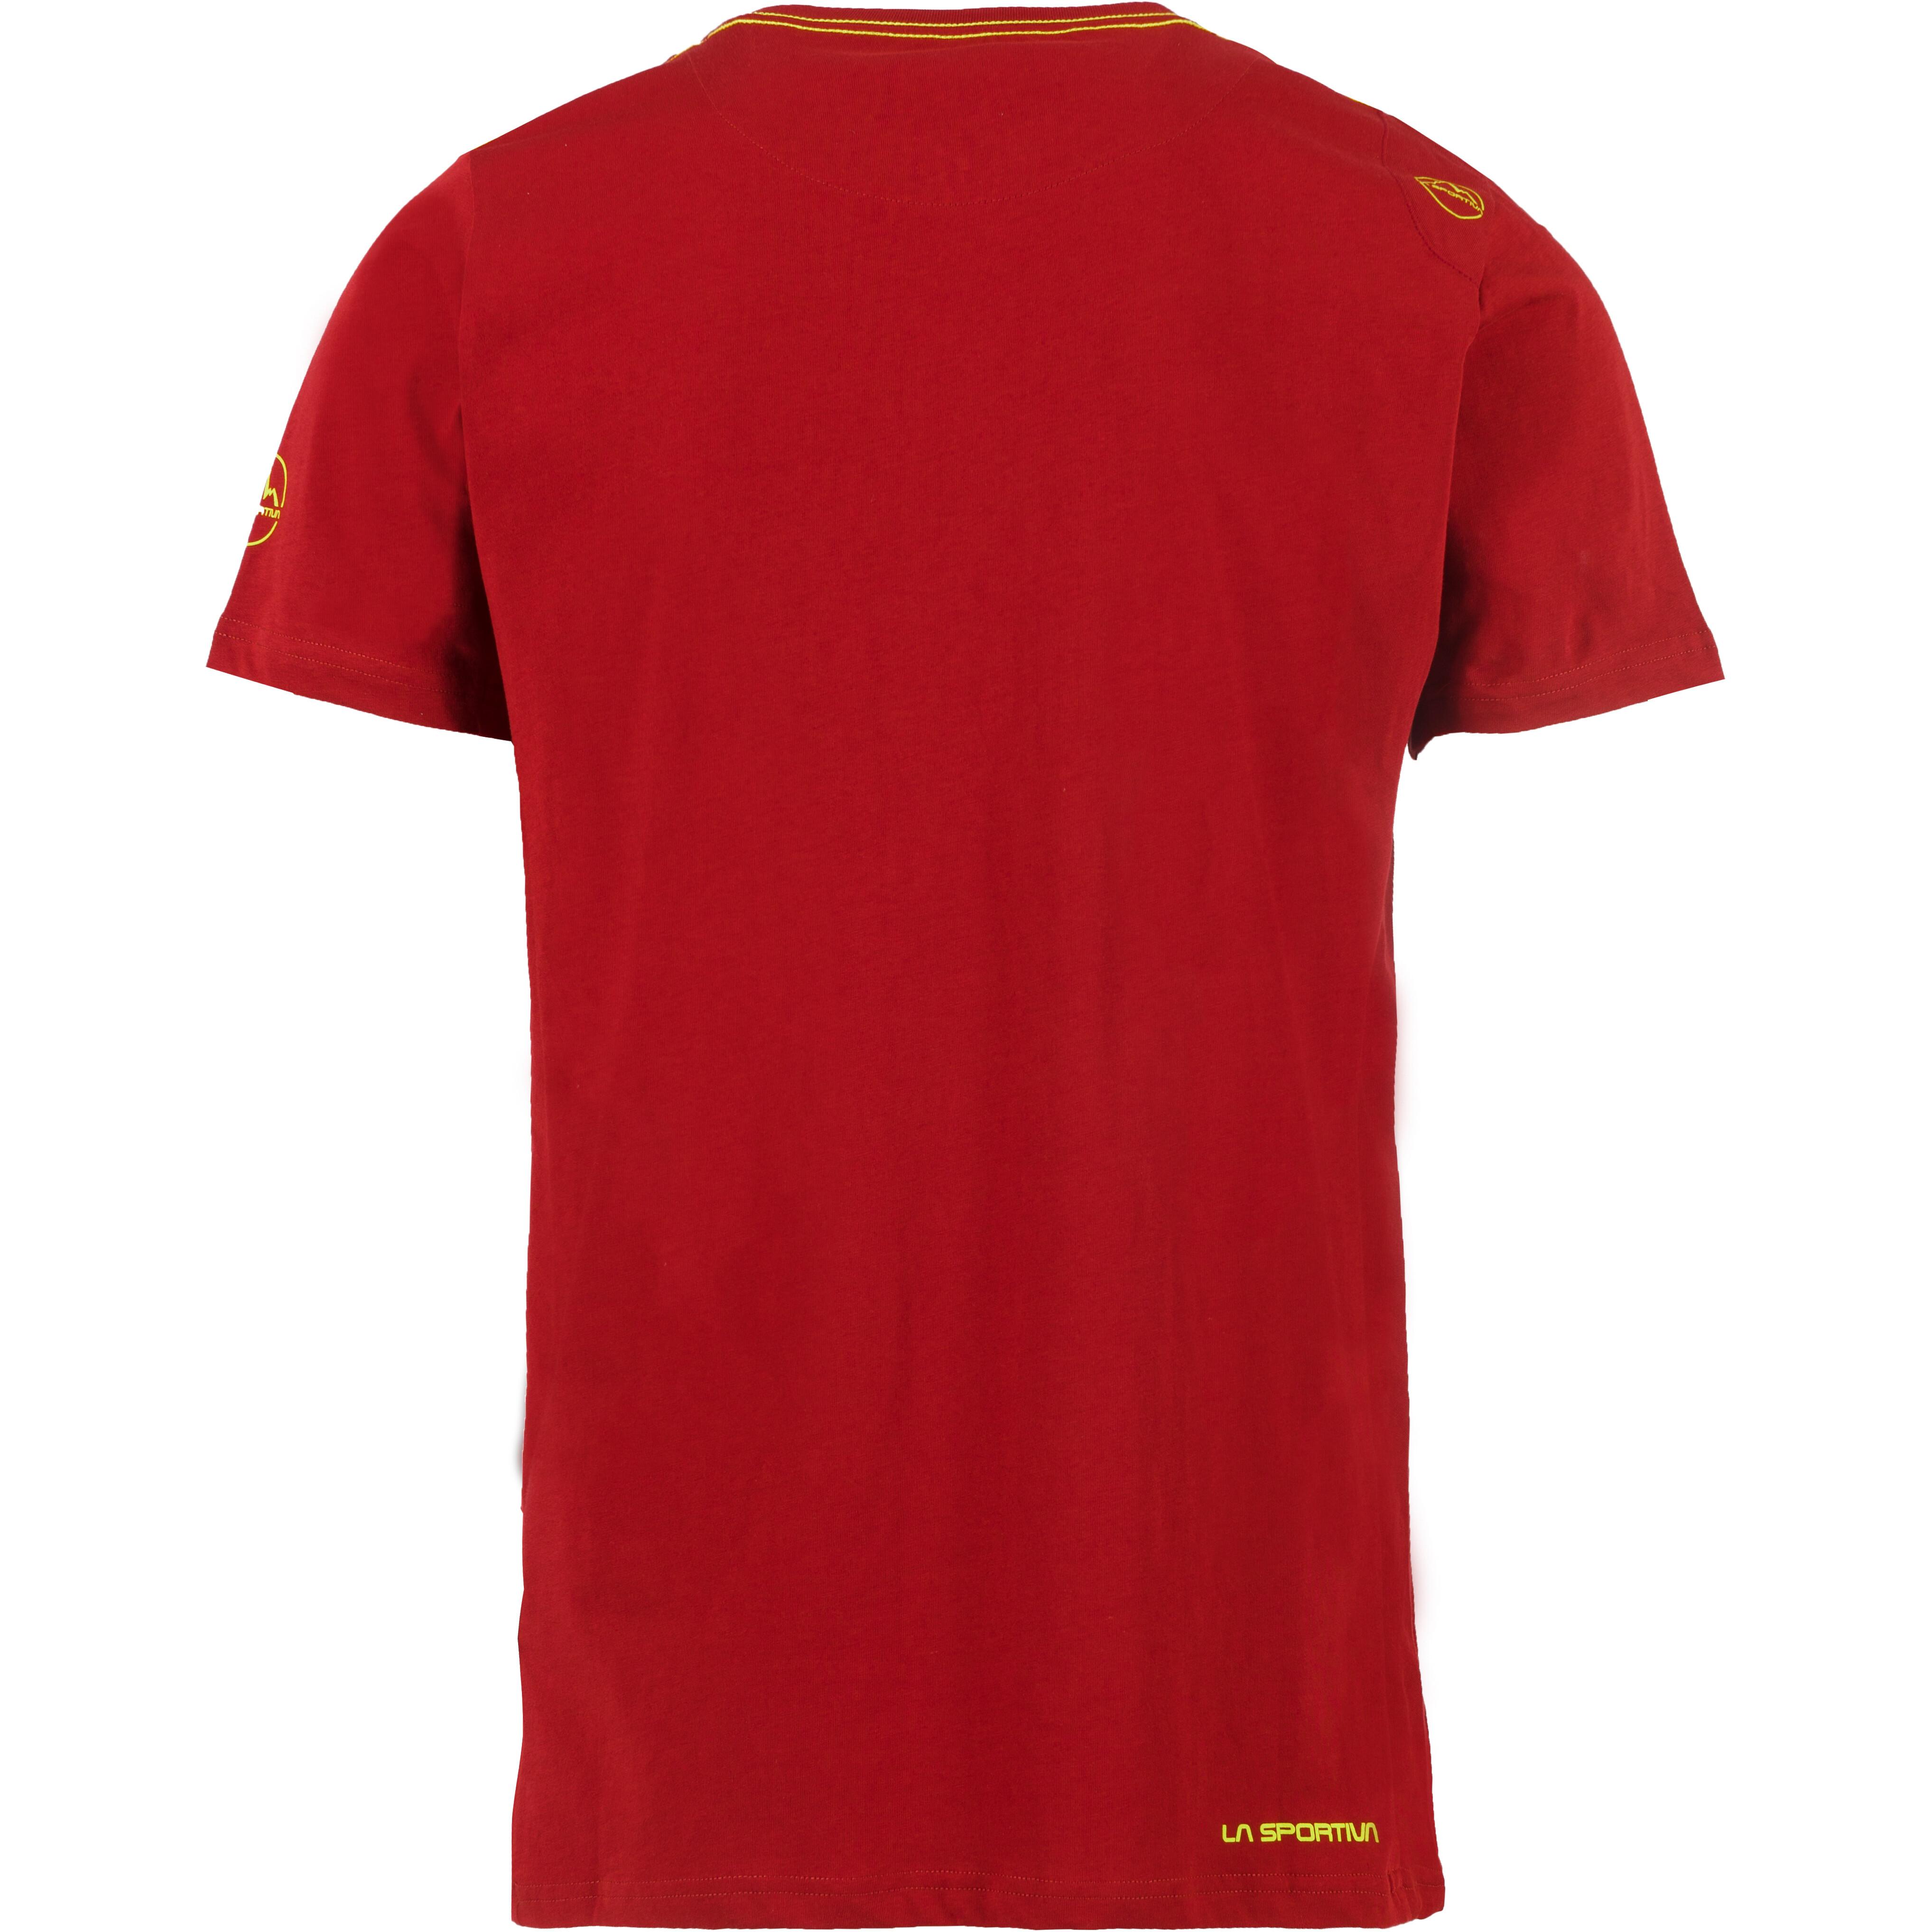 LasportivaHipsterLogoshirt